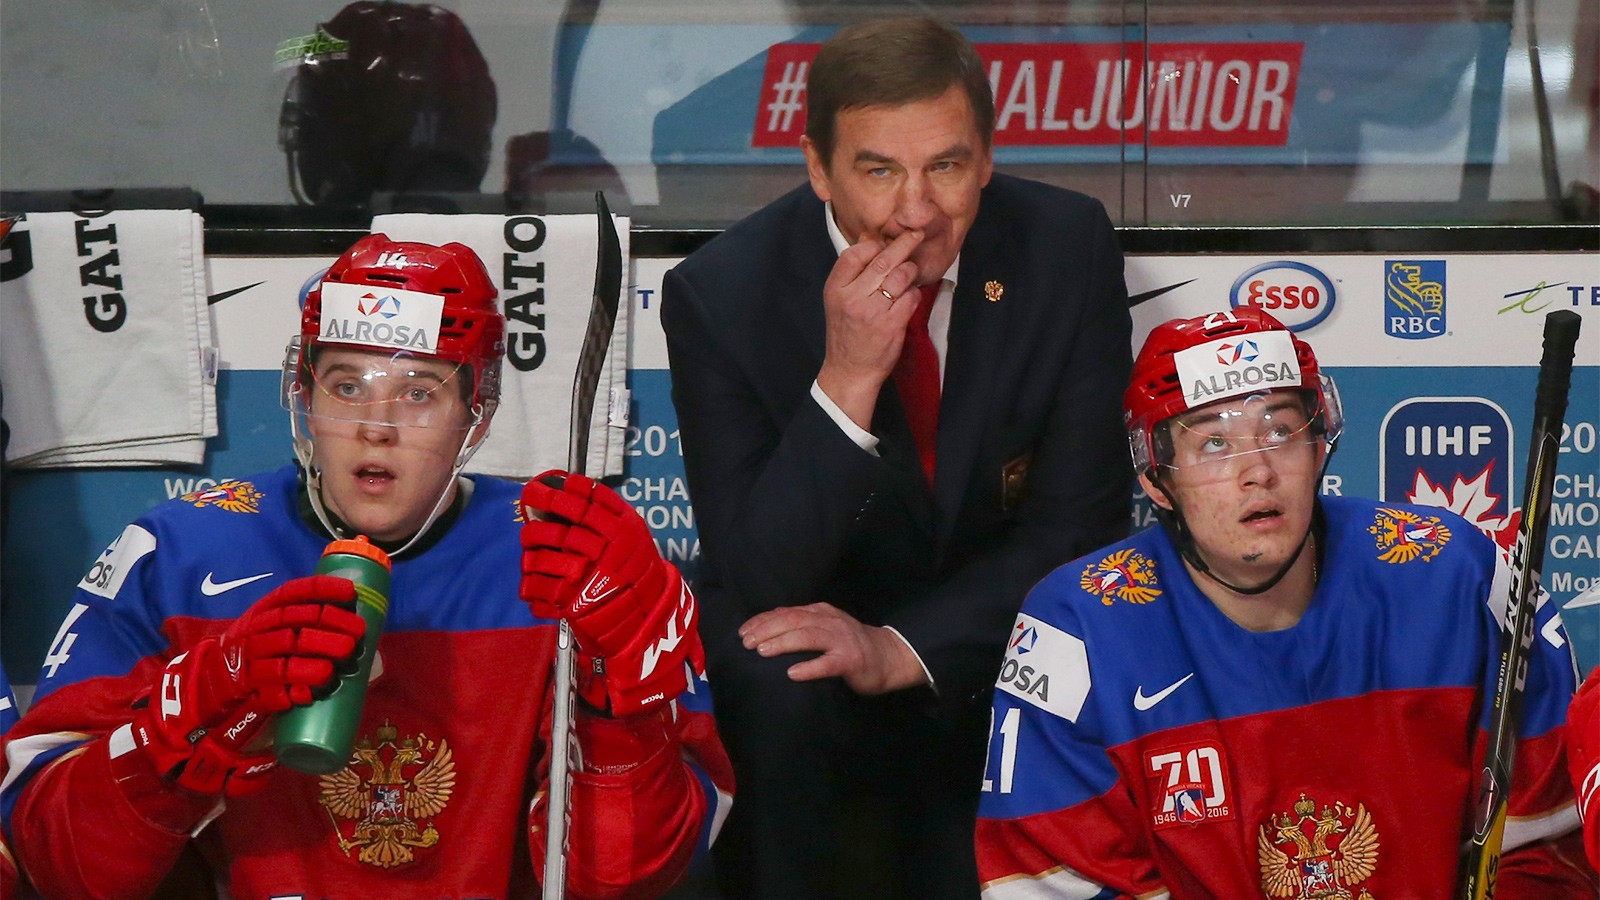 Олимпиада с участием НХЛ – не для Брагина-совместителя - фото